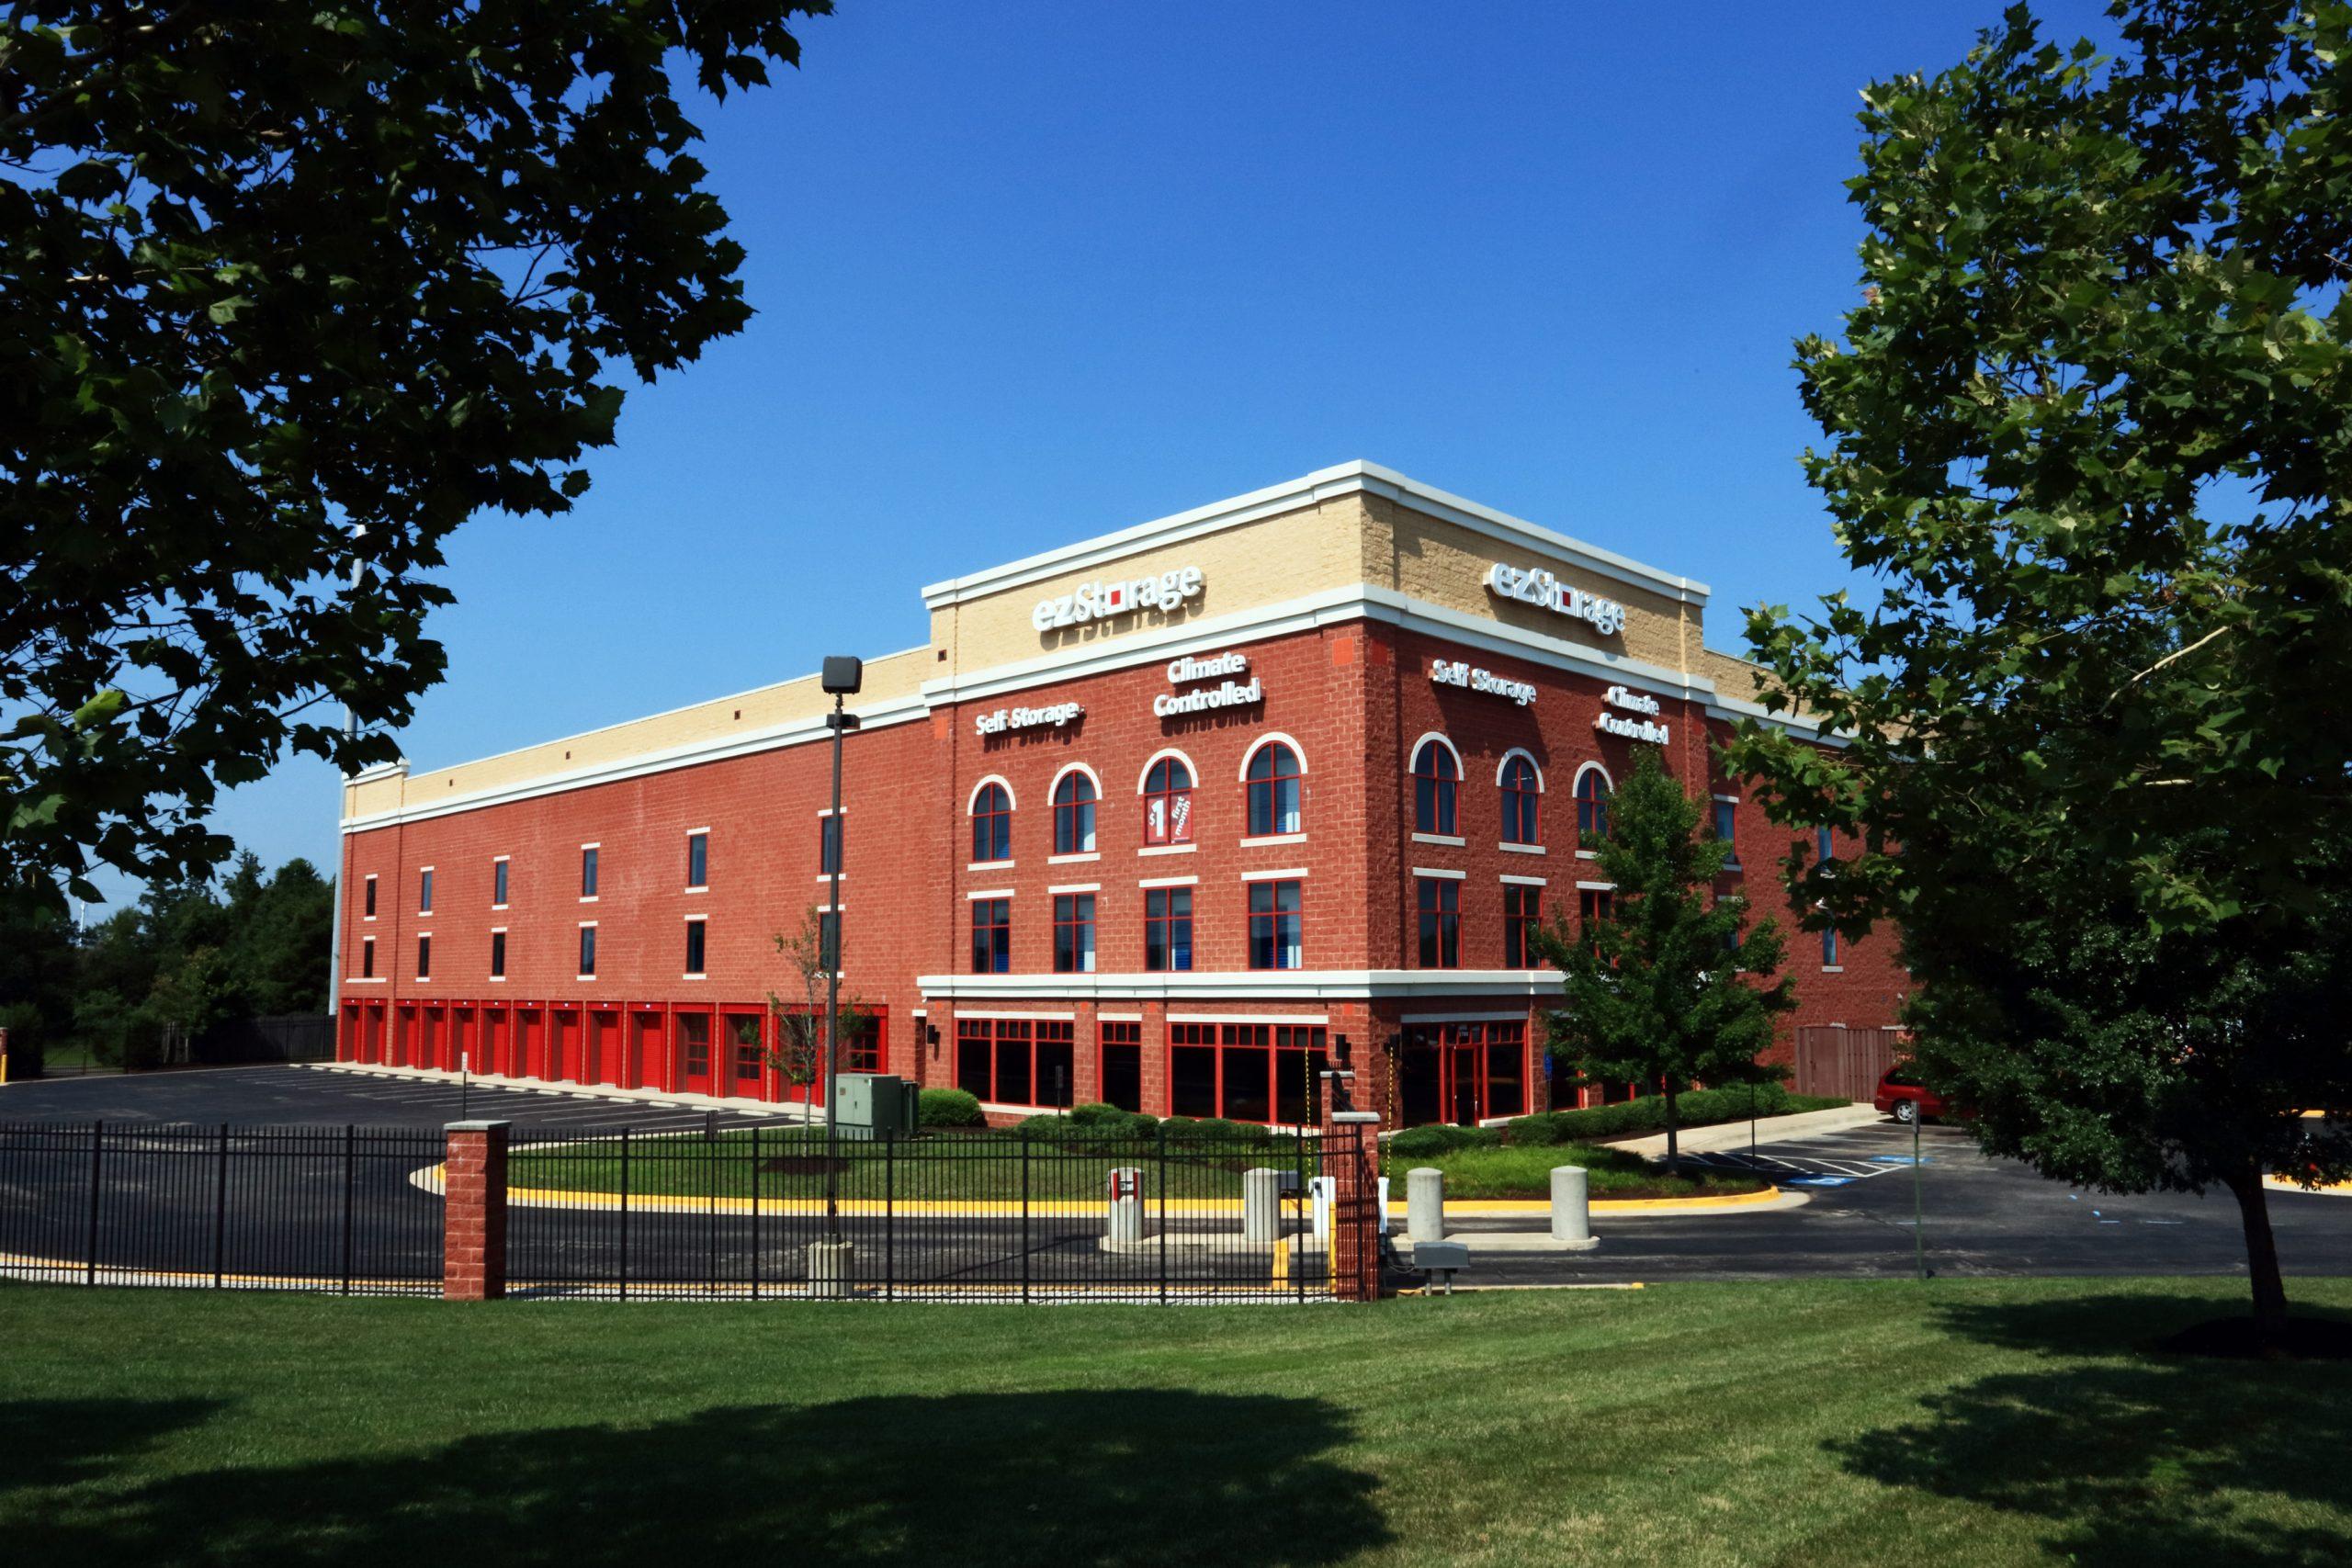 Exterior Photograph of Ez Storage Facility in Chantilly, Virginia